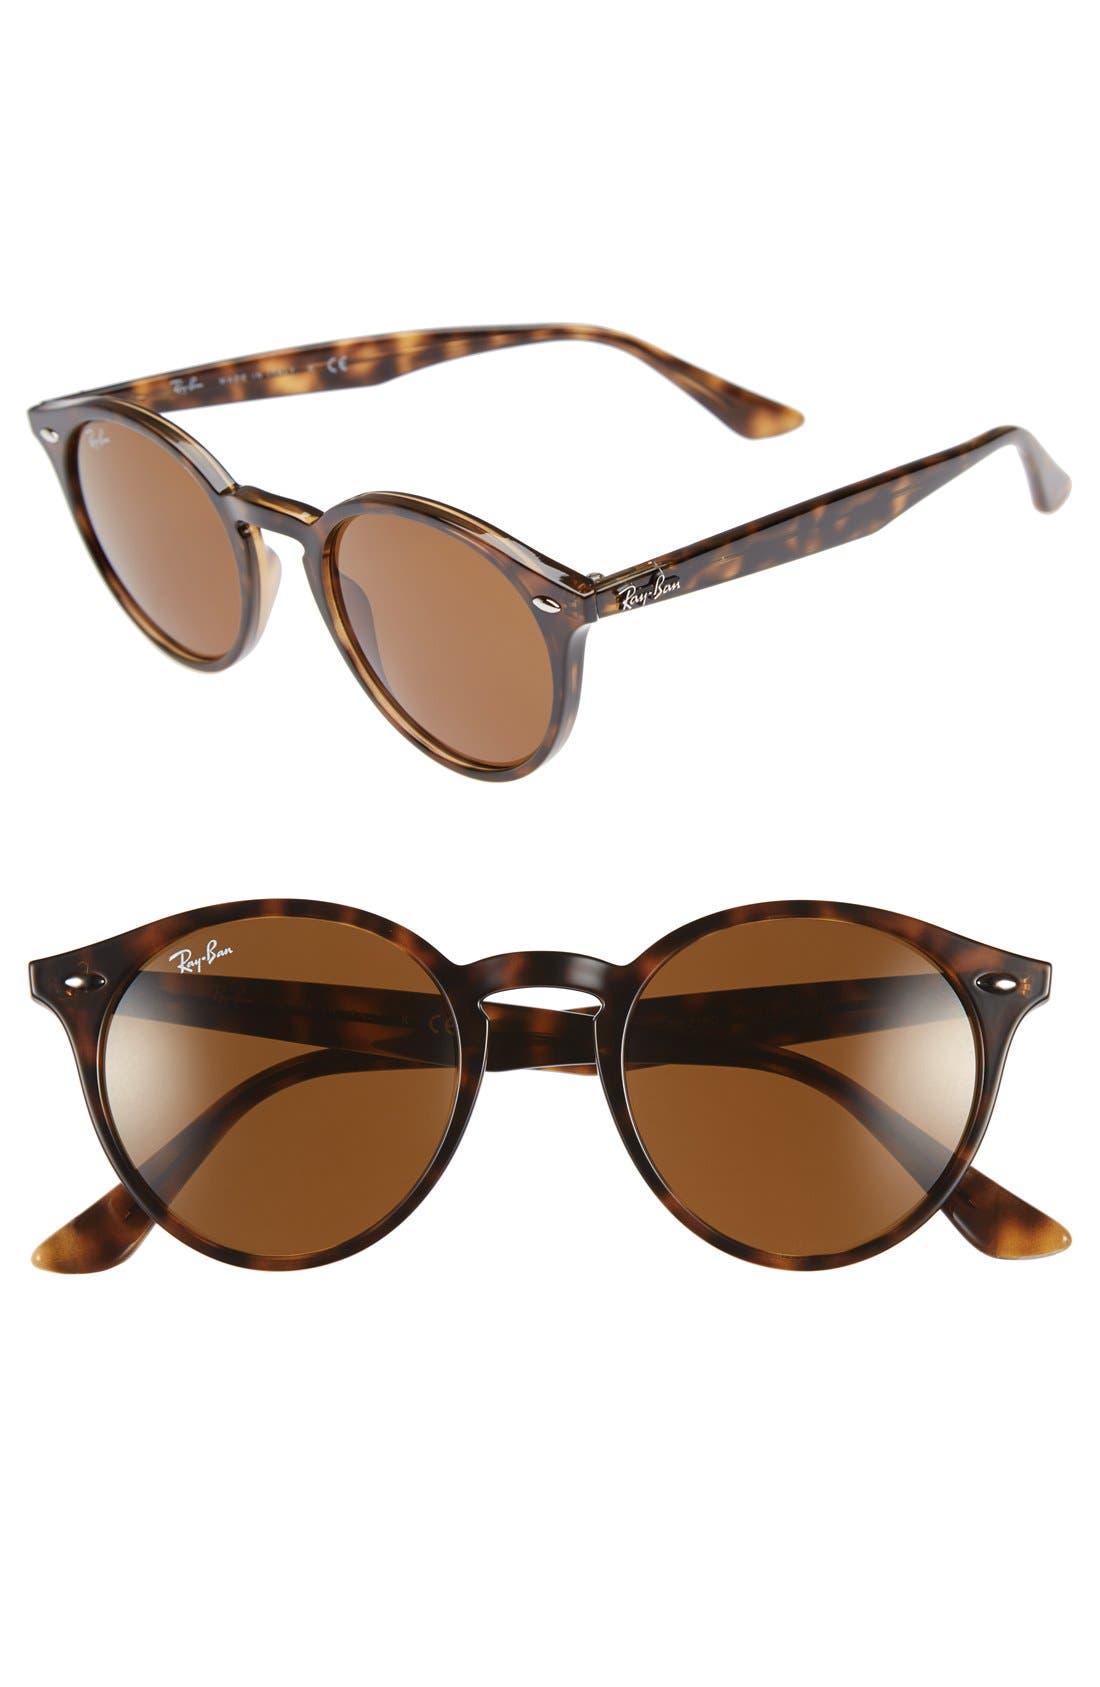 RAY-BAN, Highstreet 49mm Round Sunglasses, Main thumbnail 1, color, DARK HAVANA